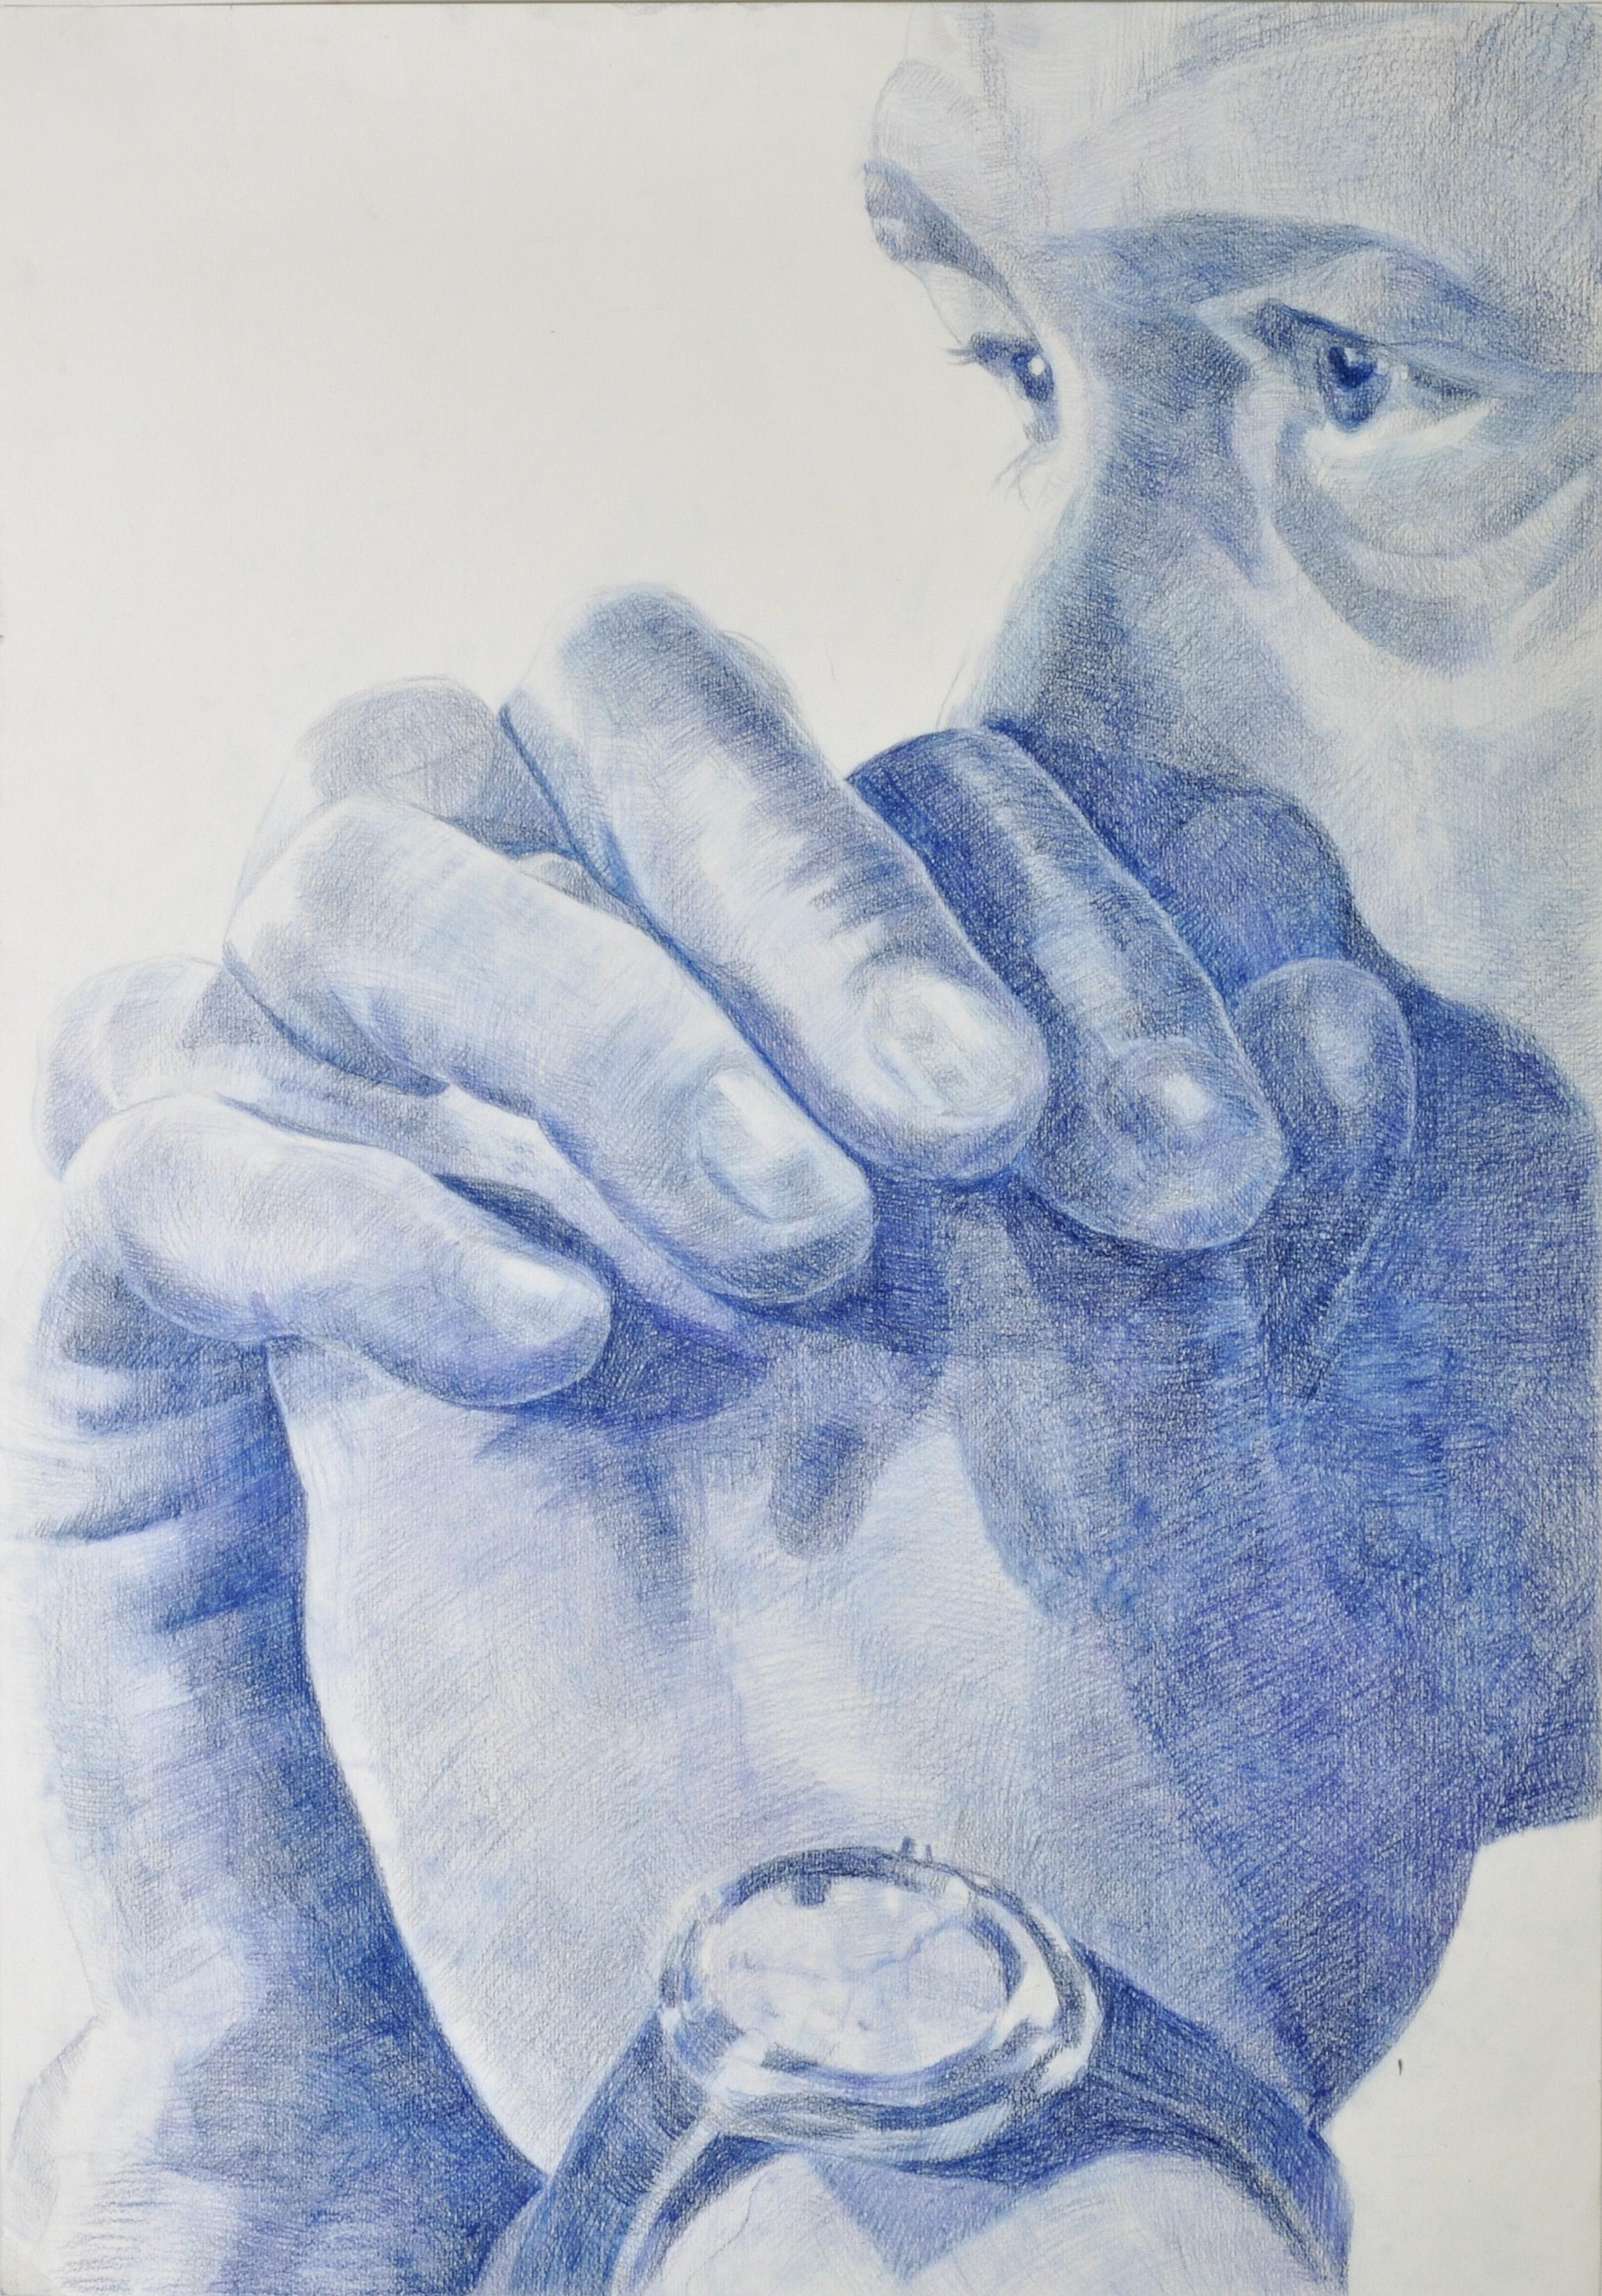 Praying Hands #7